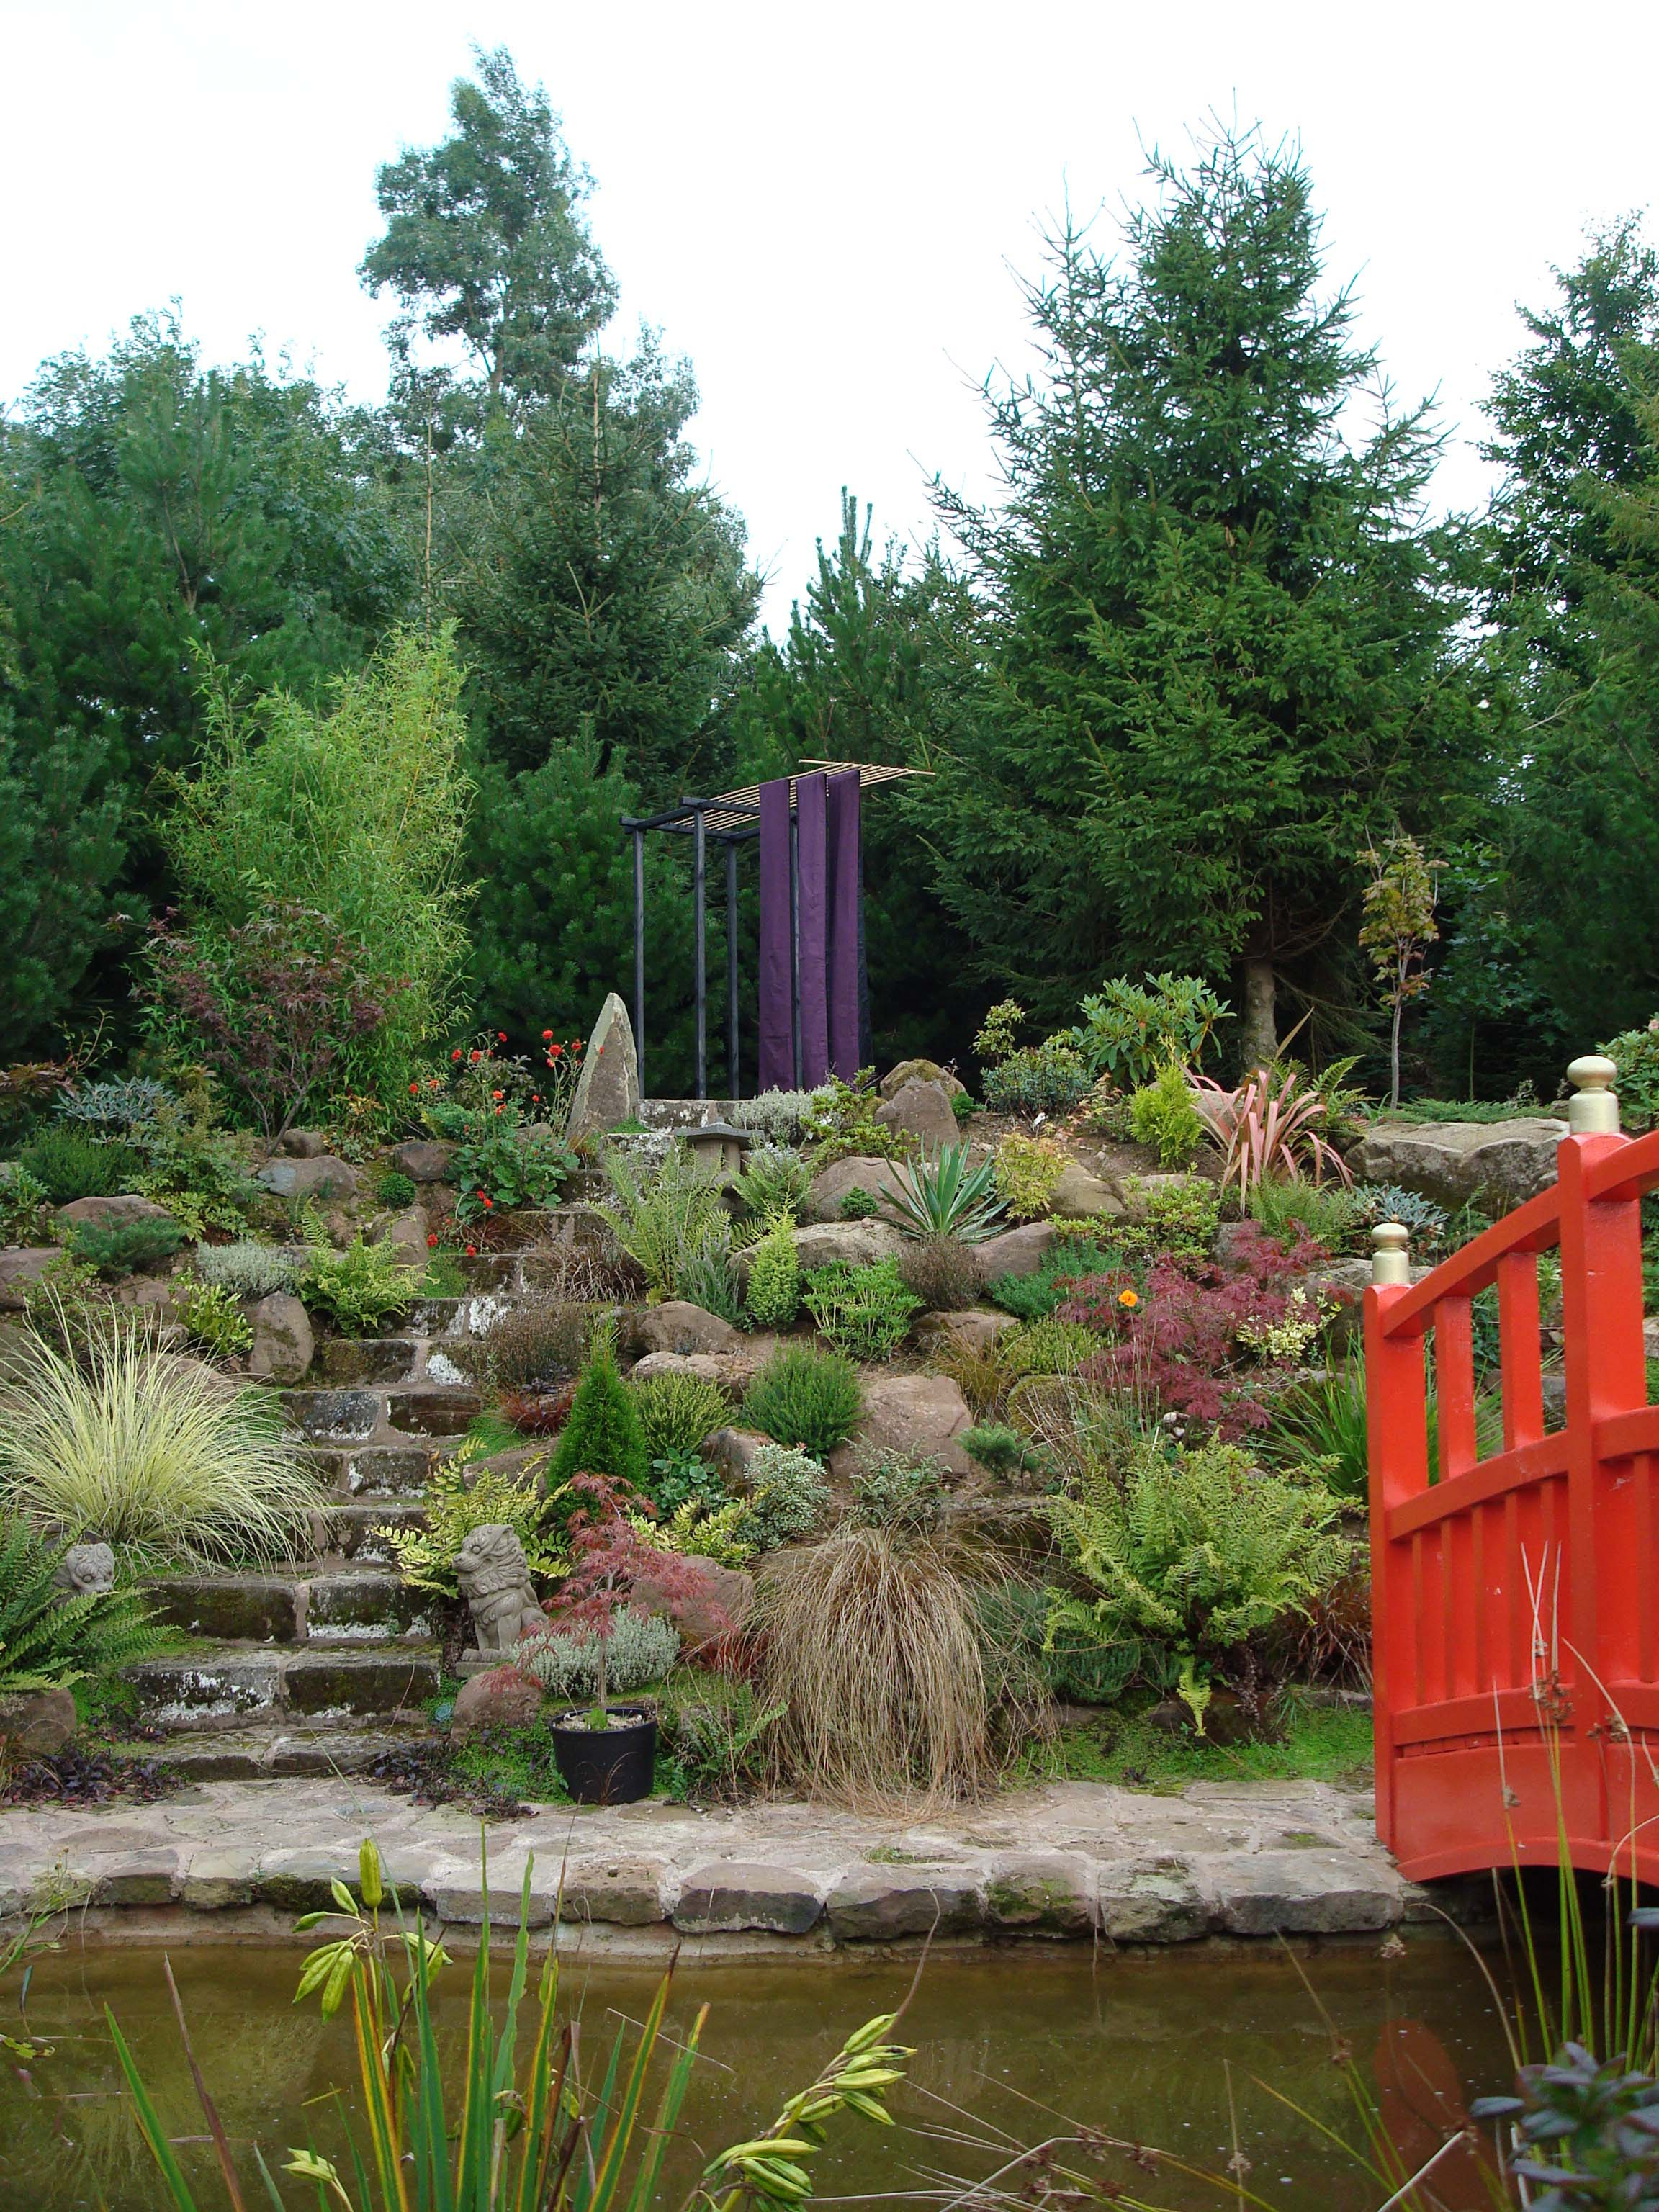 Obi Mount Pleasant Gardens 2008 a.jpg